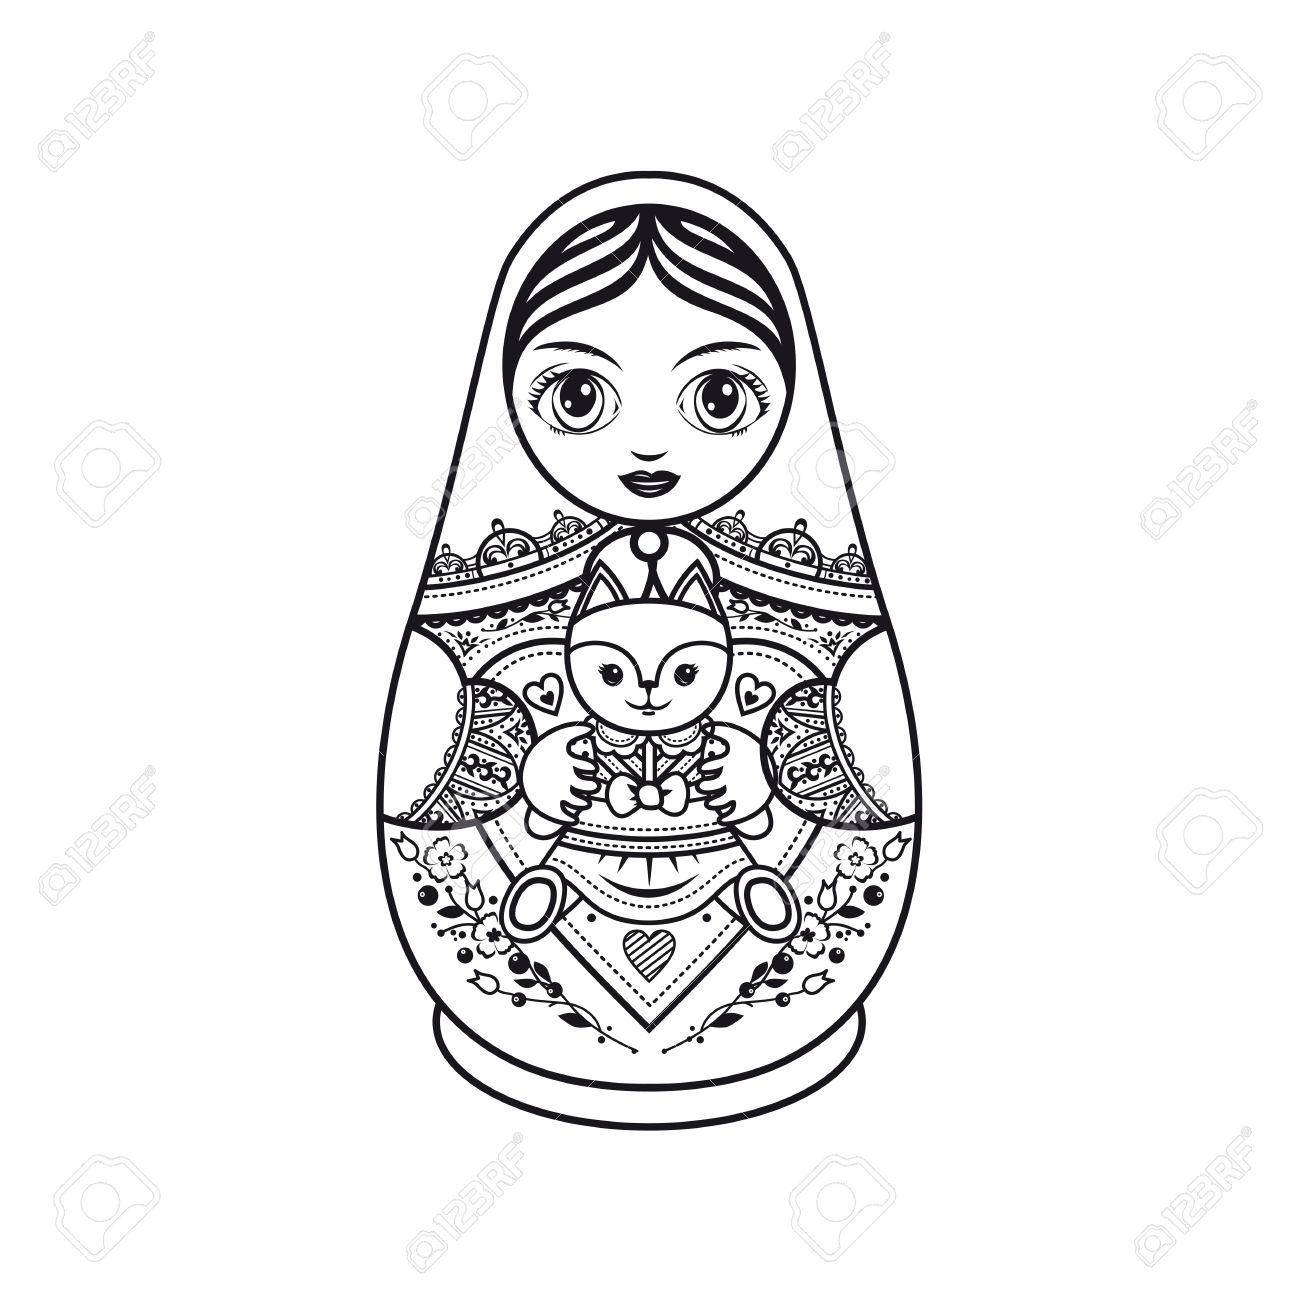 1300x1300 Matryoshka. Russian Folk Nesting Doll. Babushka Doll. Template